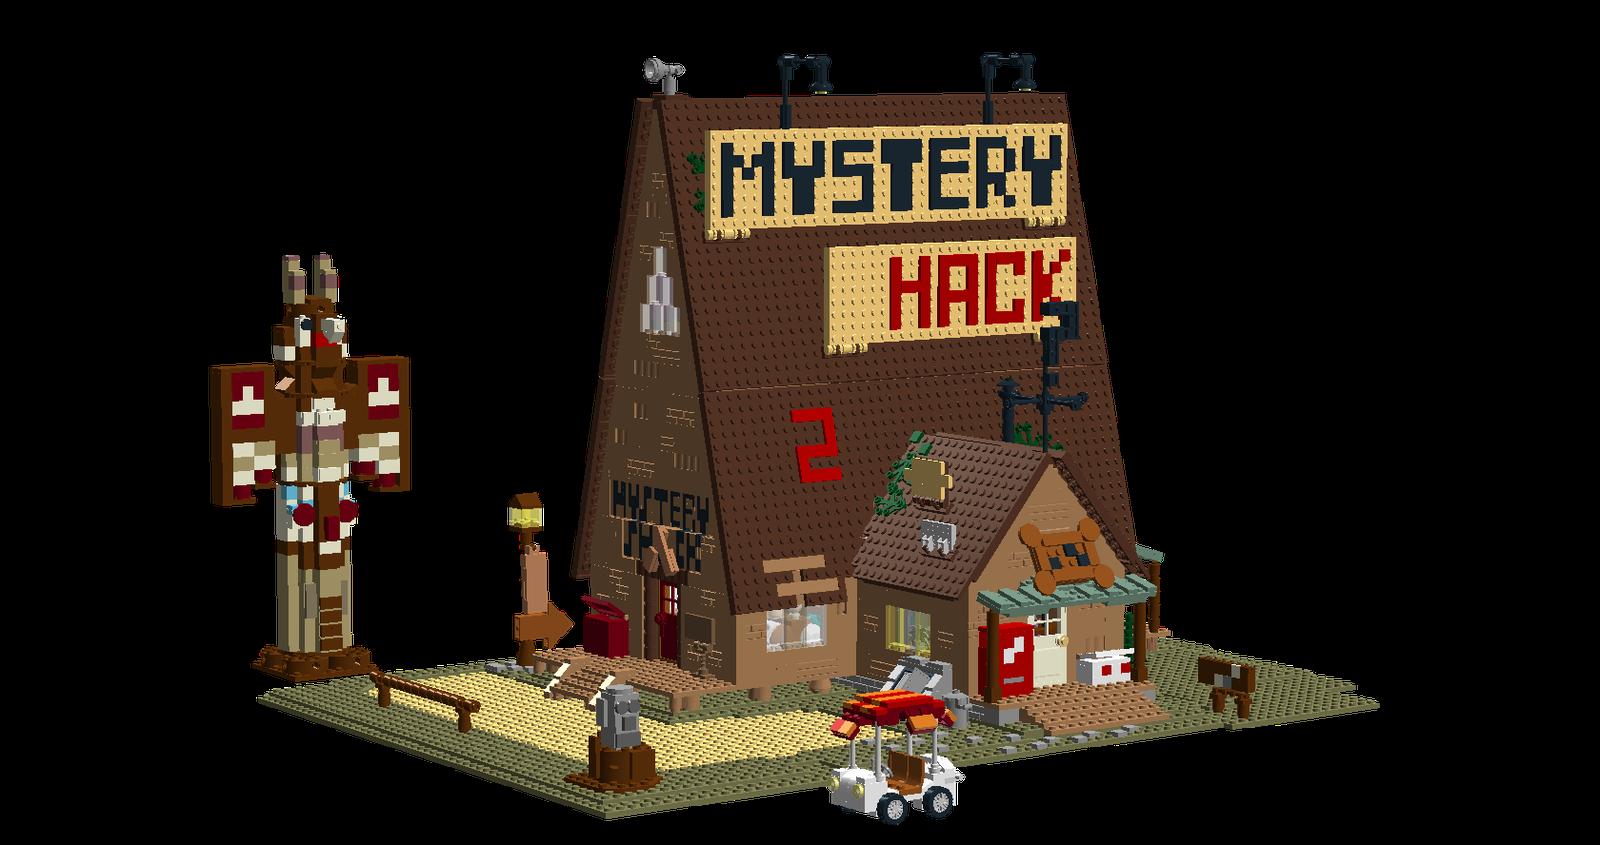 Mystery Shack Gravity Falls